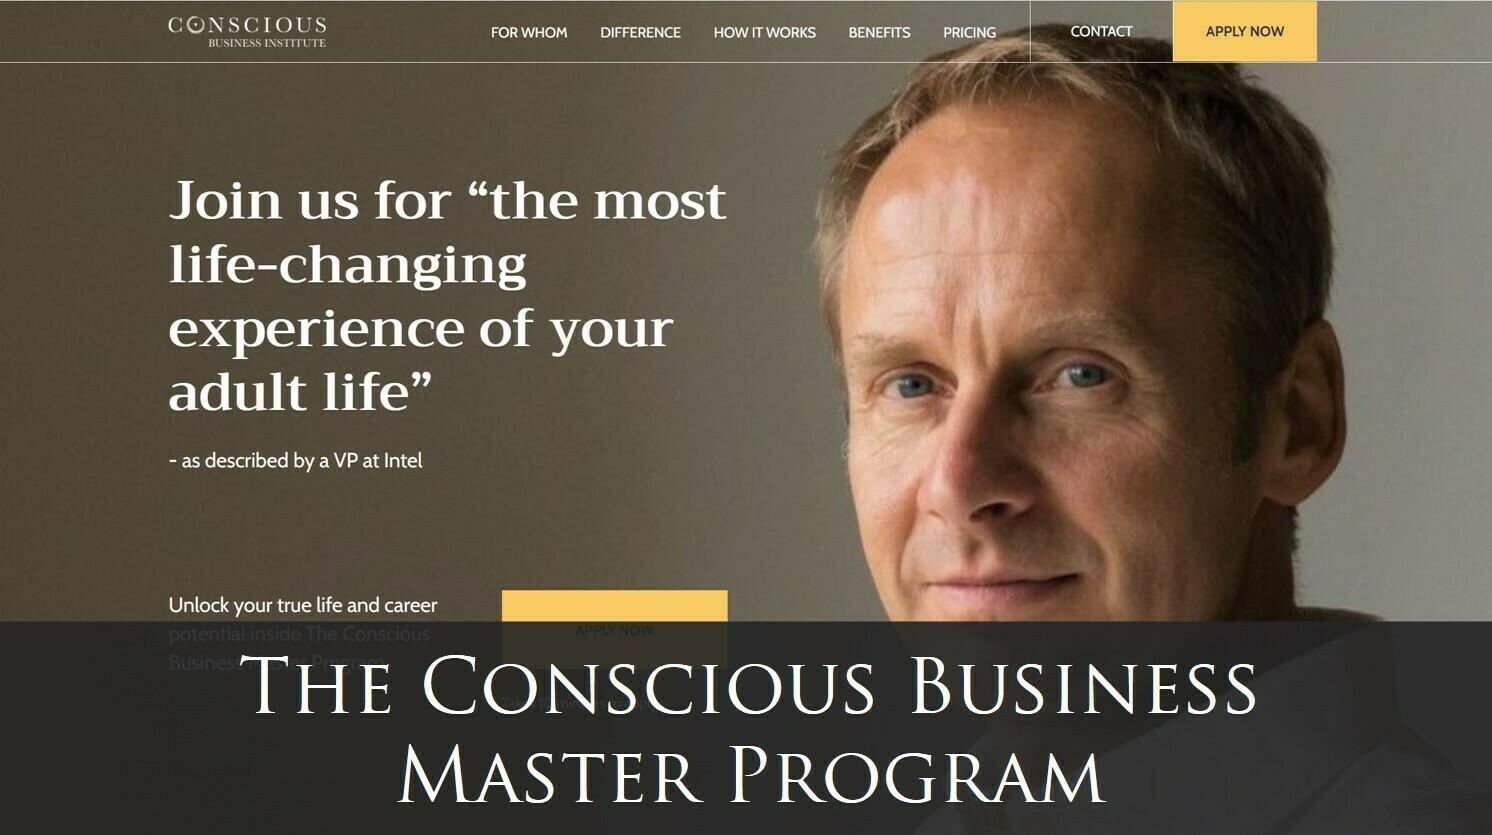 Conscious Business Master Program - First Installment